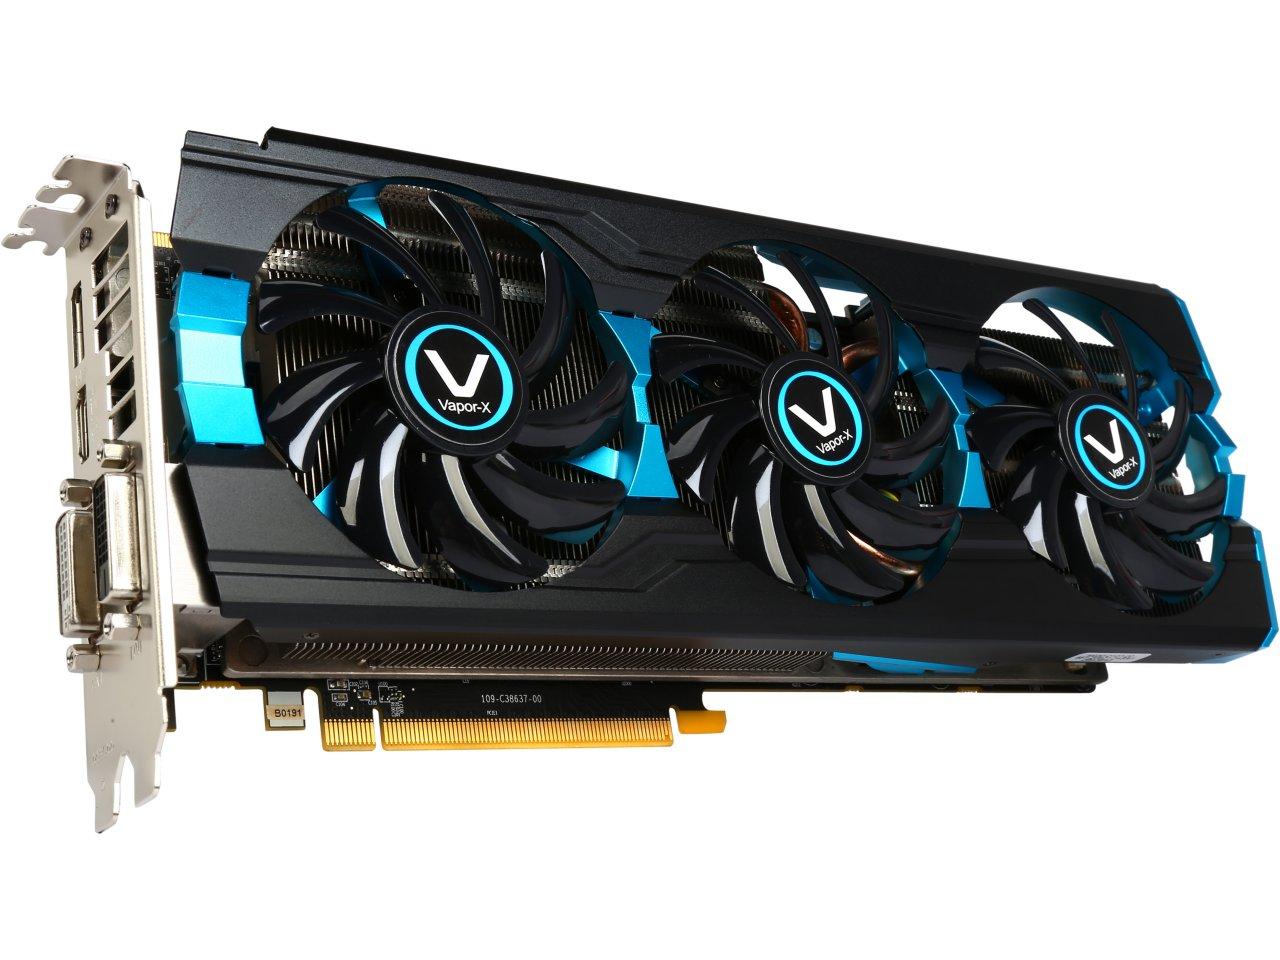 Sapphire Vapor-X Radeon R9 280X 3GB GDDR5 PCIE Video Card  $190 after $20 Rebate + Free Shipping